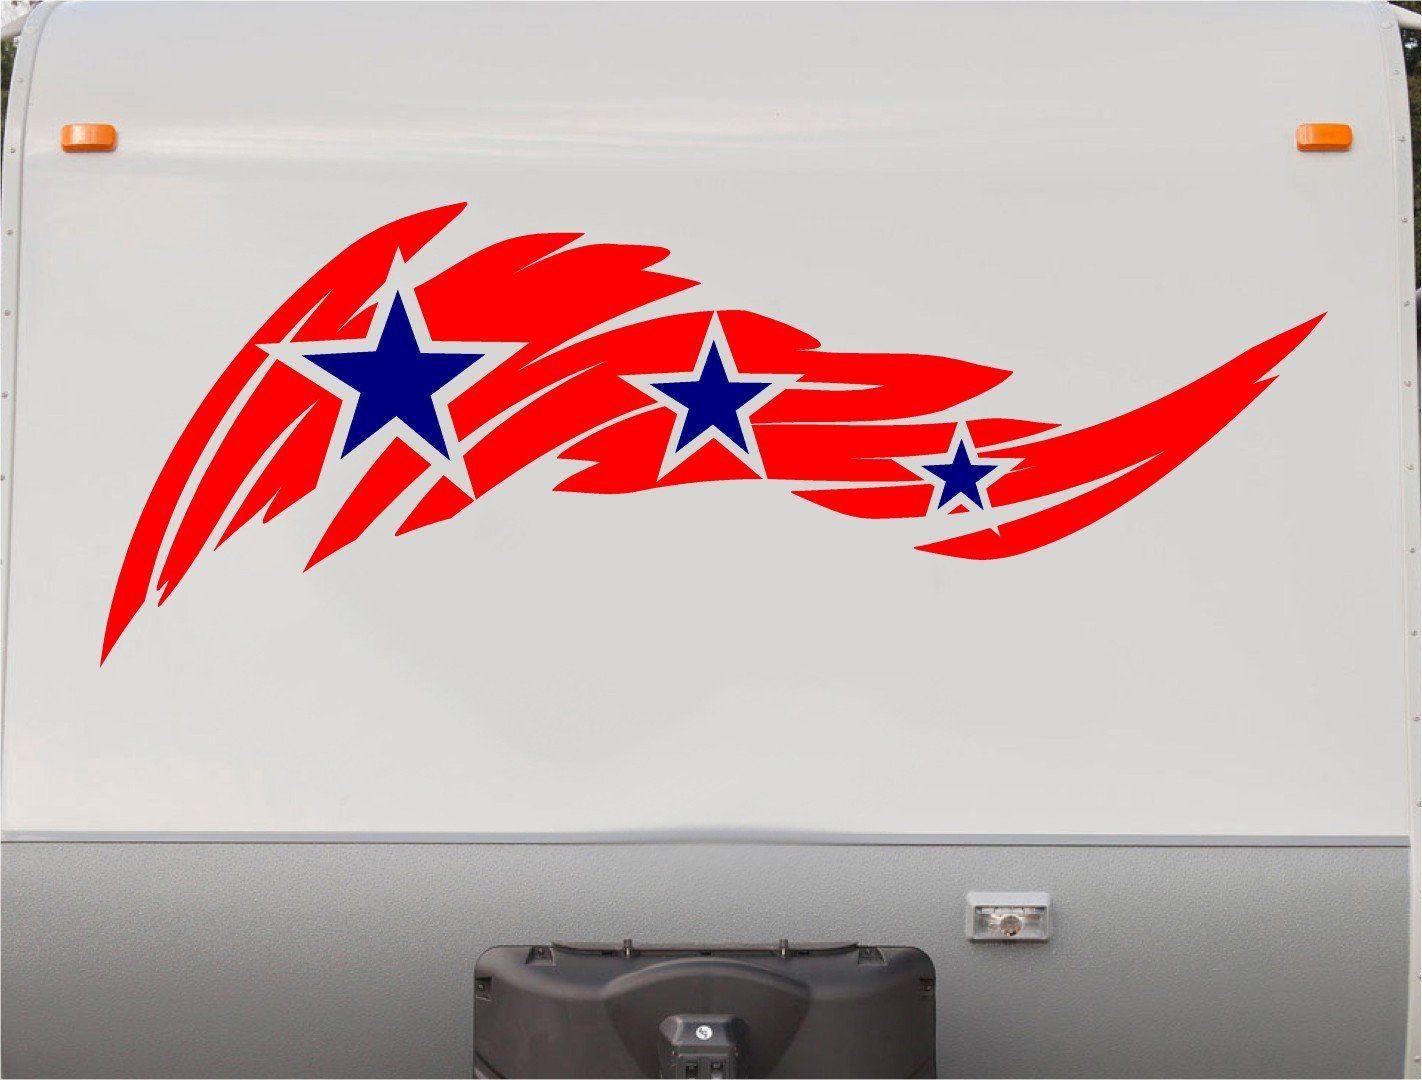 Usa flag stars and stripes rv camper 5th wheel motorhome vinyl decal sticker graphic custom text mural us011